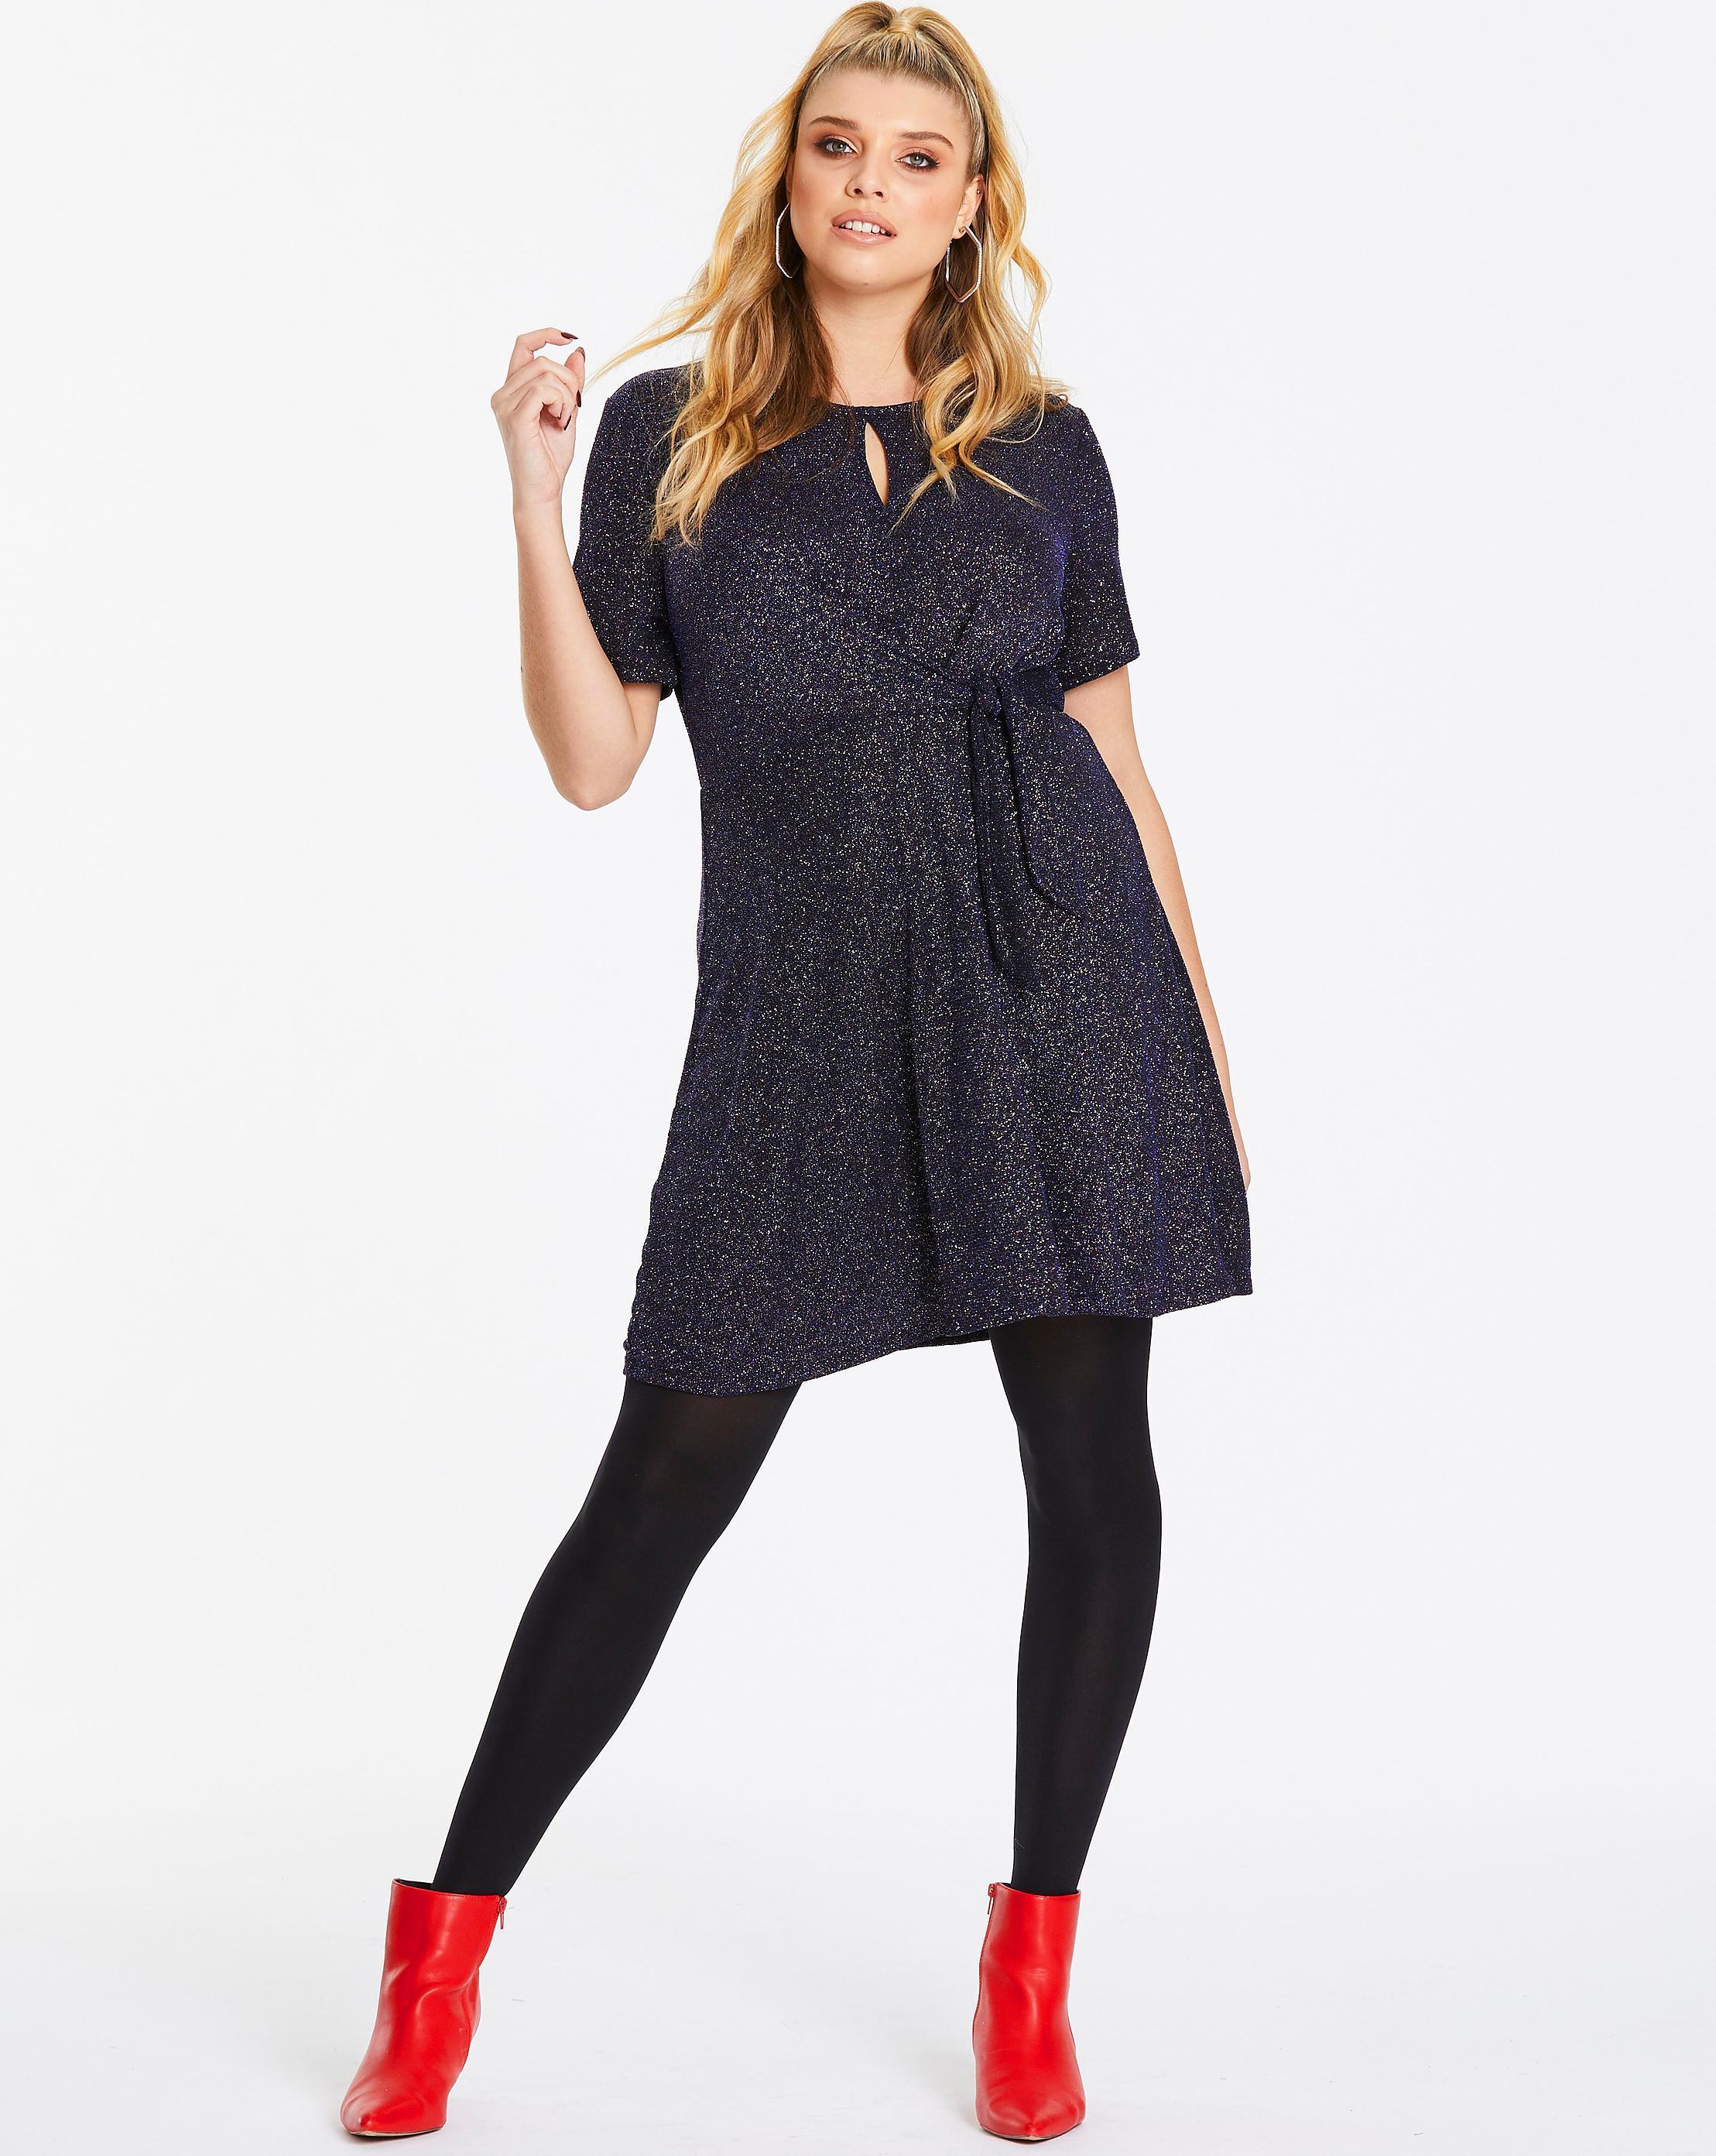 d0fcc623ddf2b Lyst - Simply Be Oasis Curve Glitterball Tie Side Skater Dress in Blue